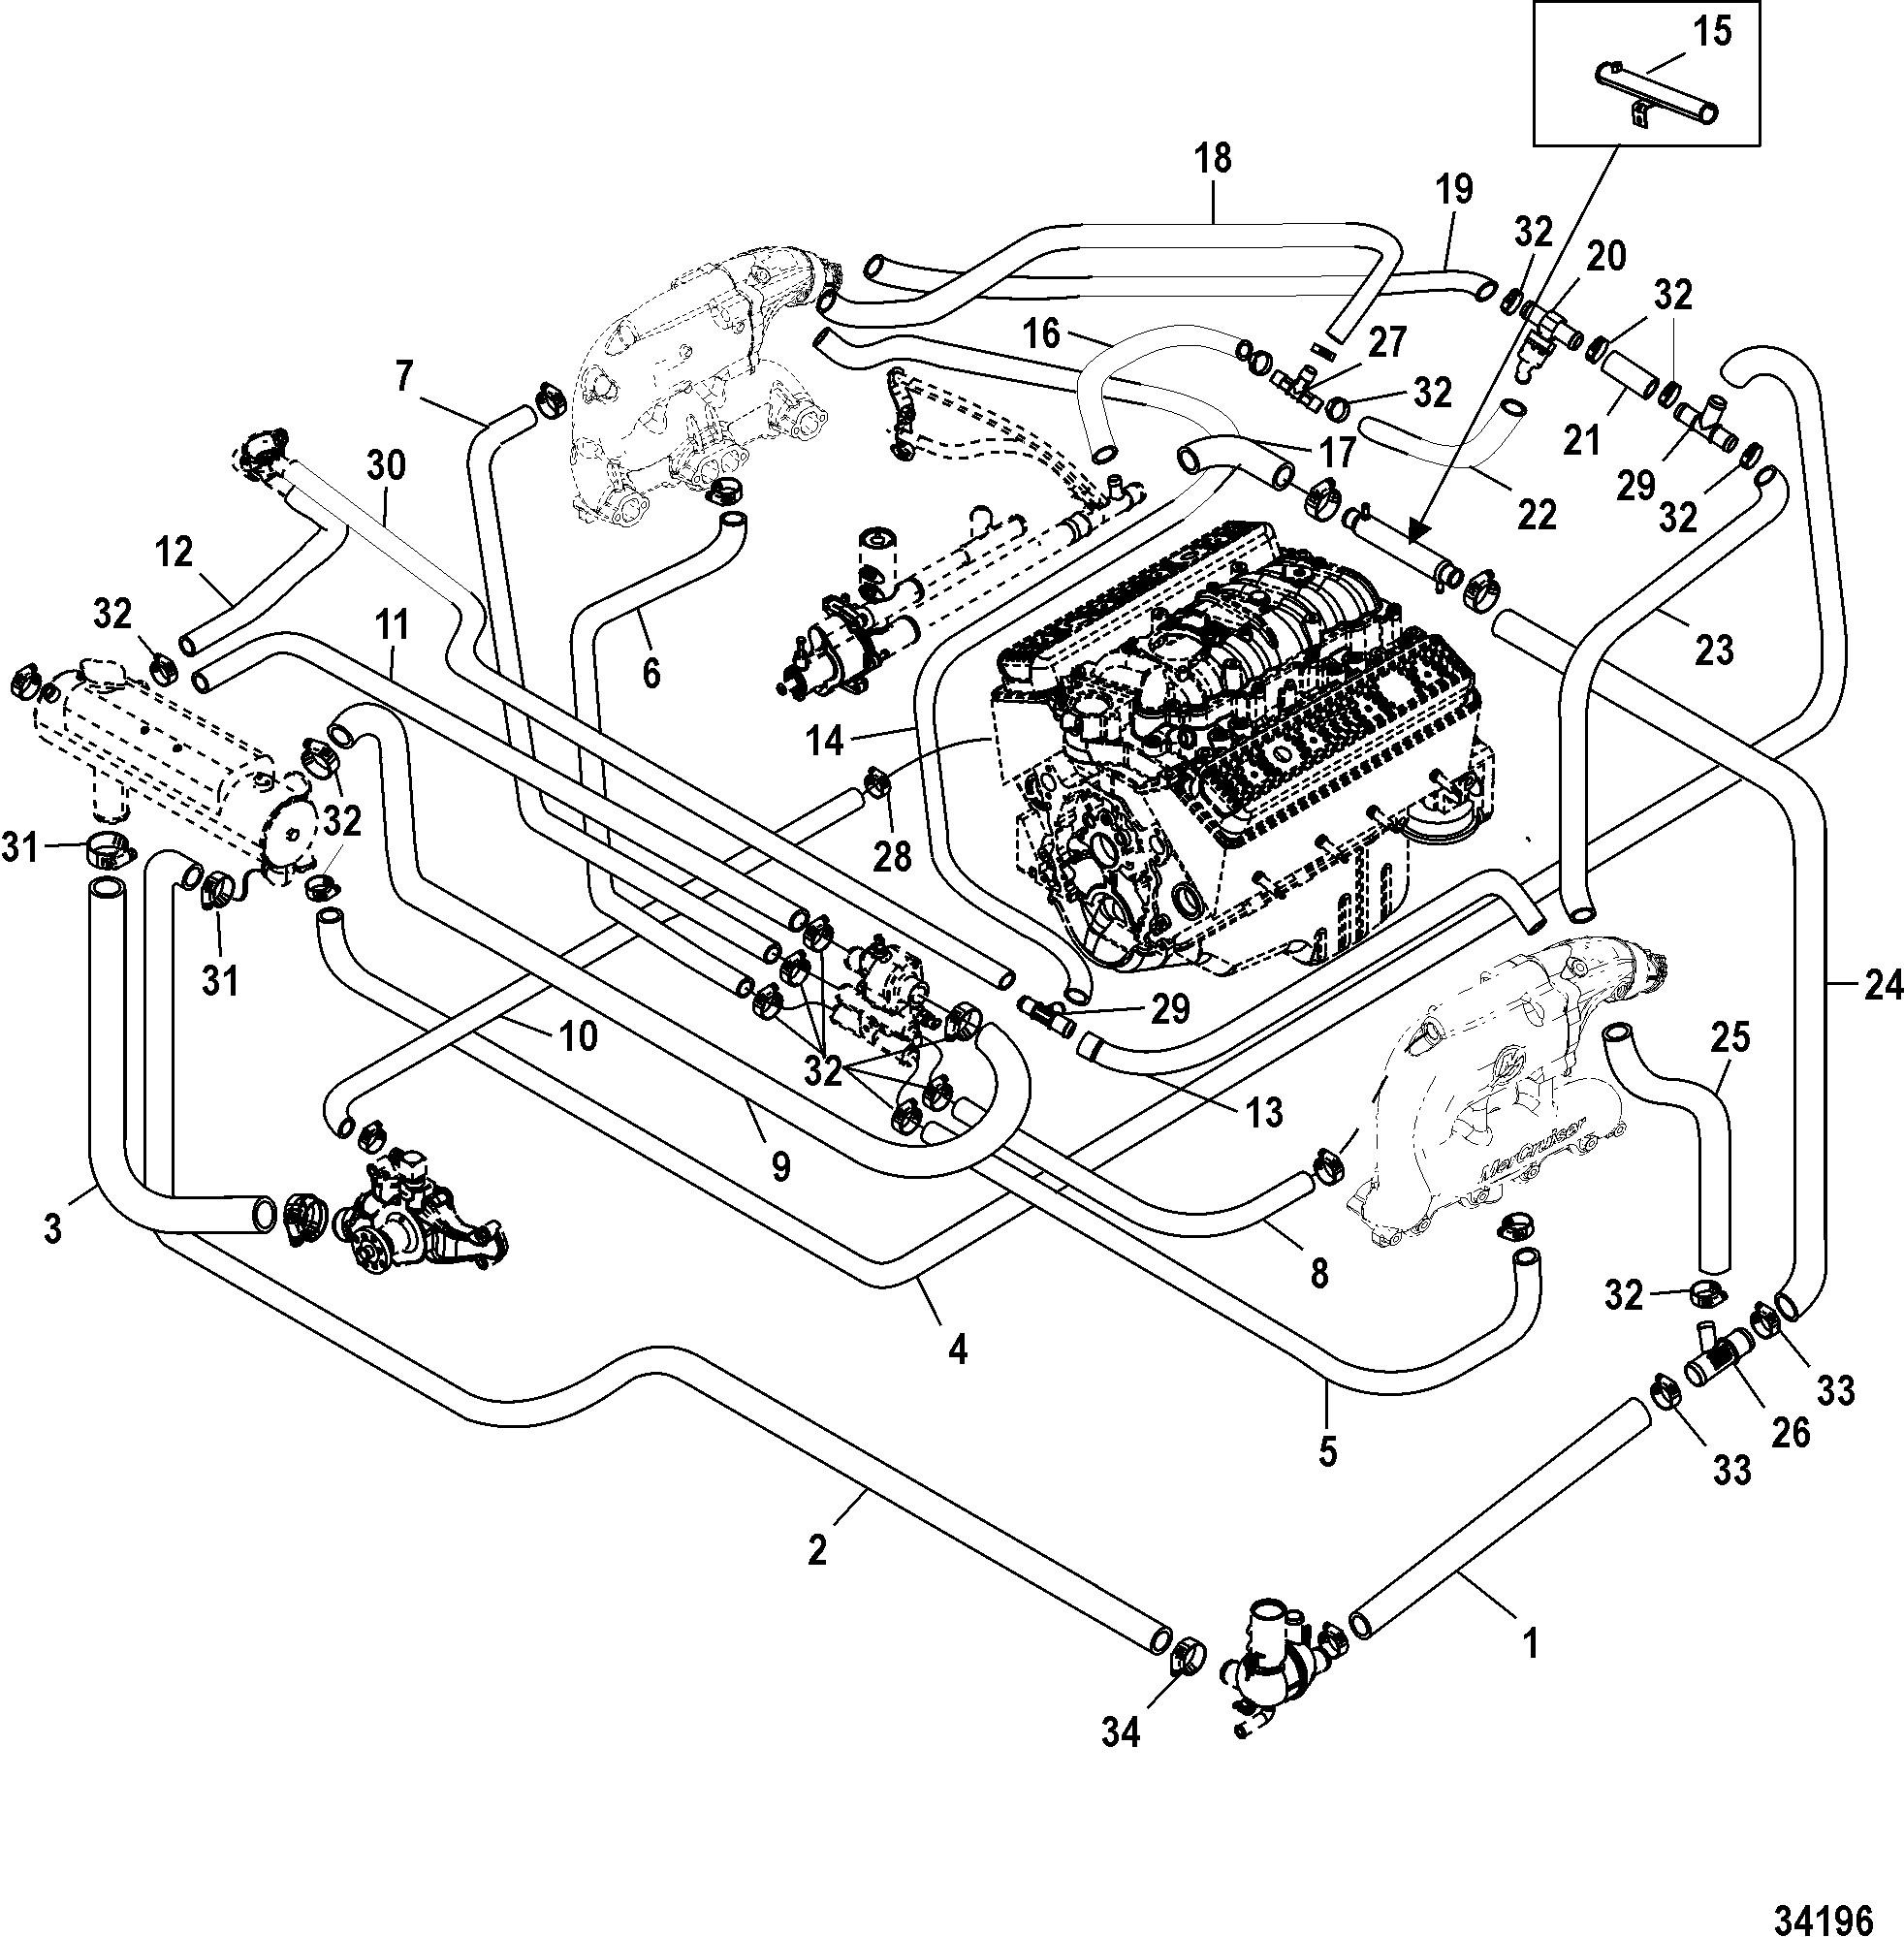 mercruiser 170 engine diagram  u00d0  u00d0 u00b0 u00d1  u00d0 u00b0 u00d0  u00d0 u00be u00d0 u00b3  u00d0 u00b7 u00d0 u00b0 u00d0 u00bf u00d1  u00d0 u00b0 u00d1  u00d1